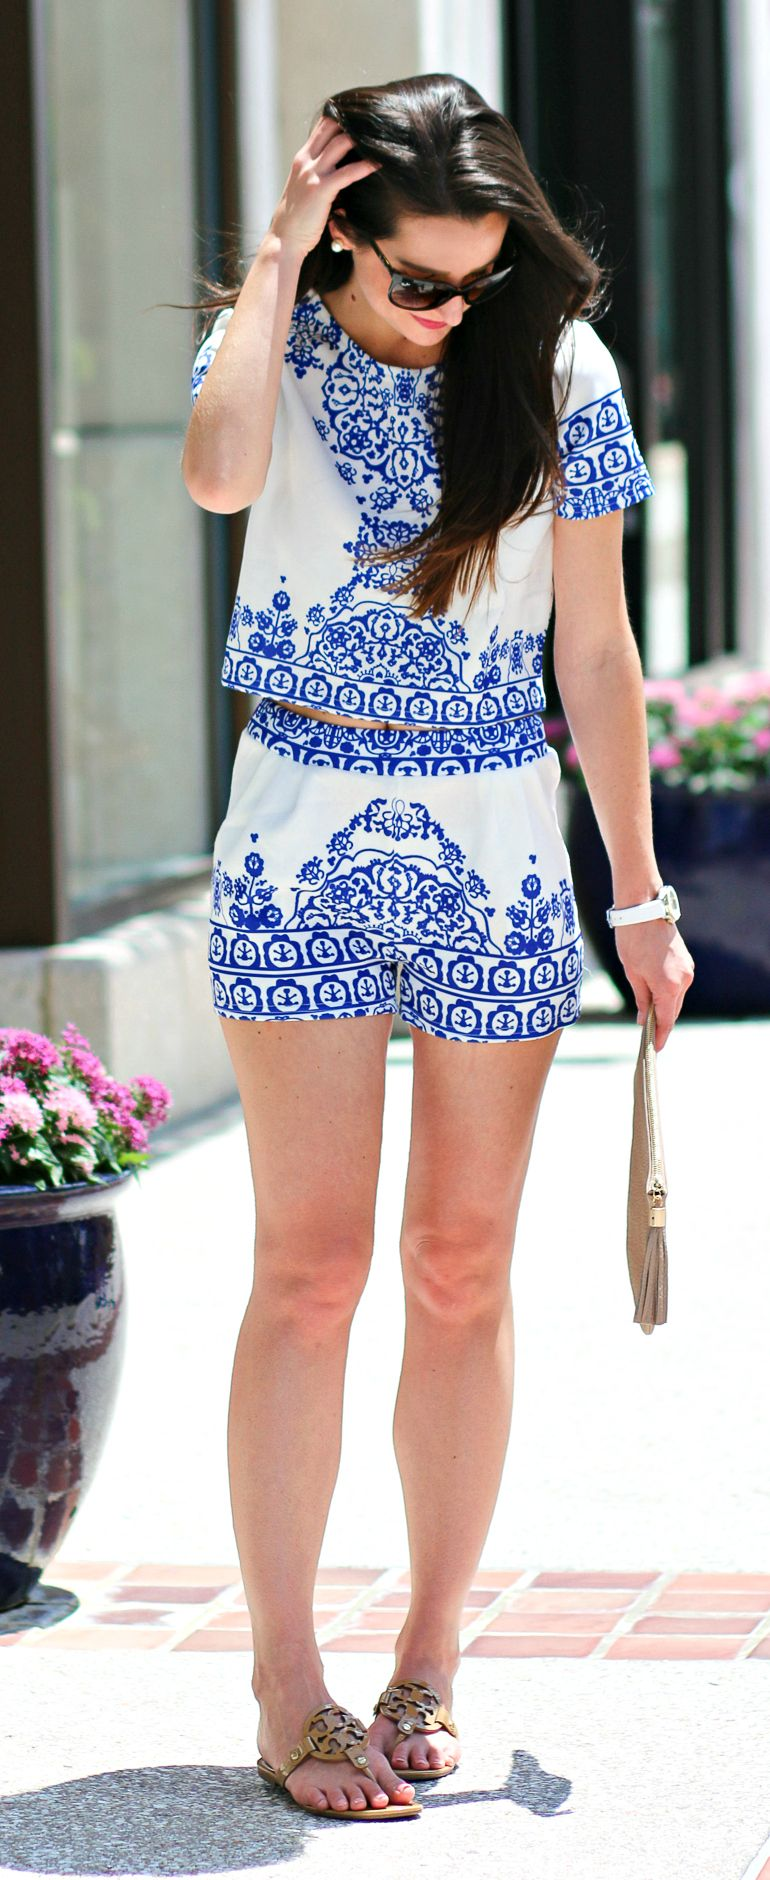 eccde8b8e30492 Blue porcelain print crop top and shorts set with sand Tory Burch Miller  sandals